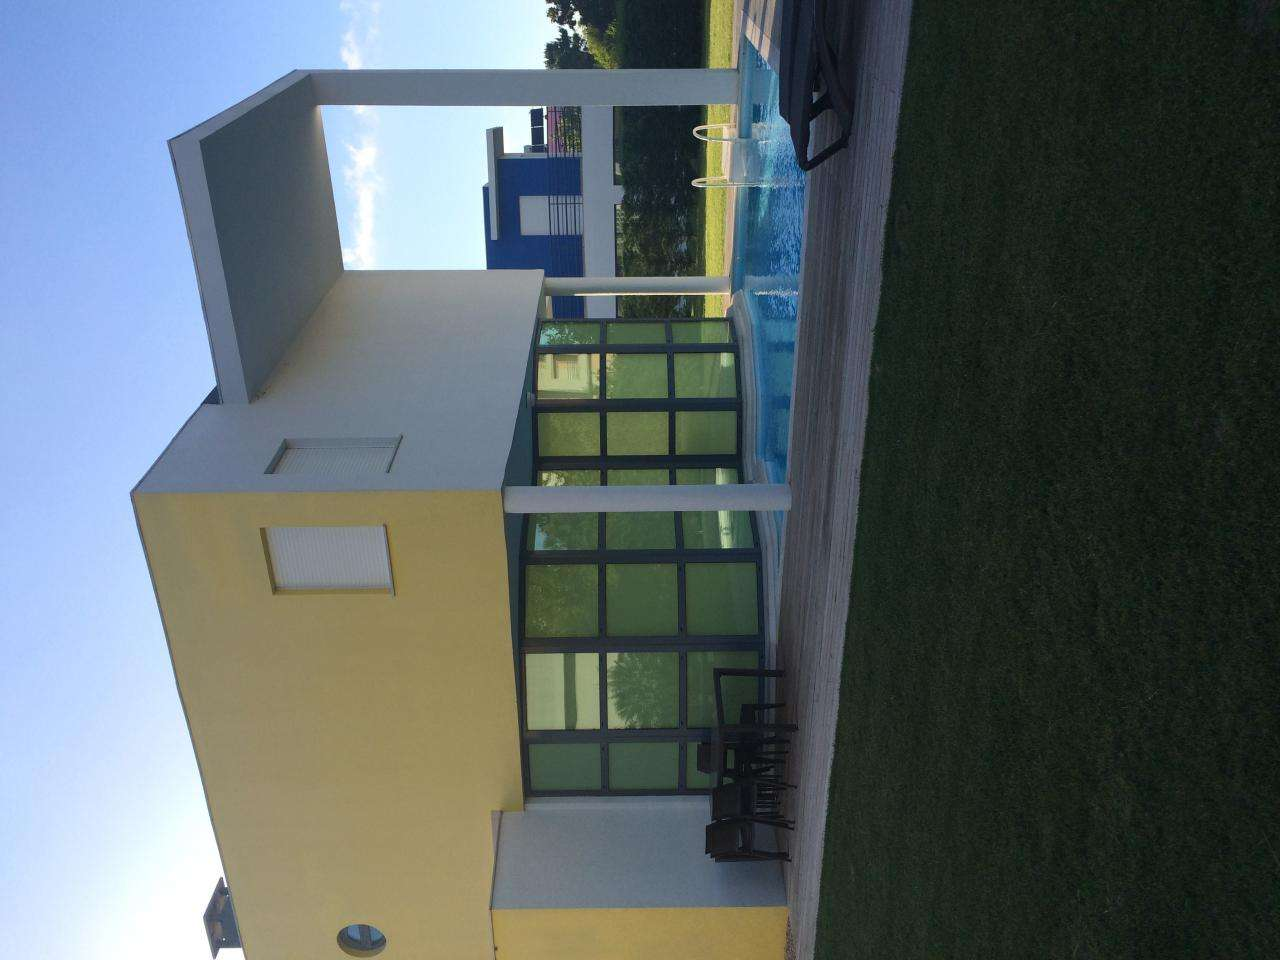 Moradia para arrendar, Quinta do Anjo, Palmela, Setúbal - Foto 1